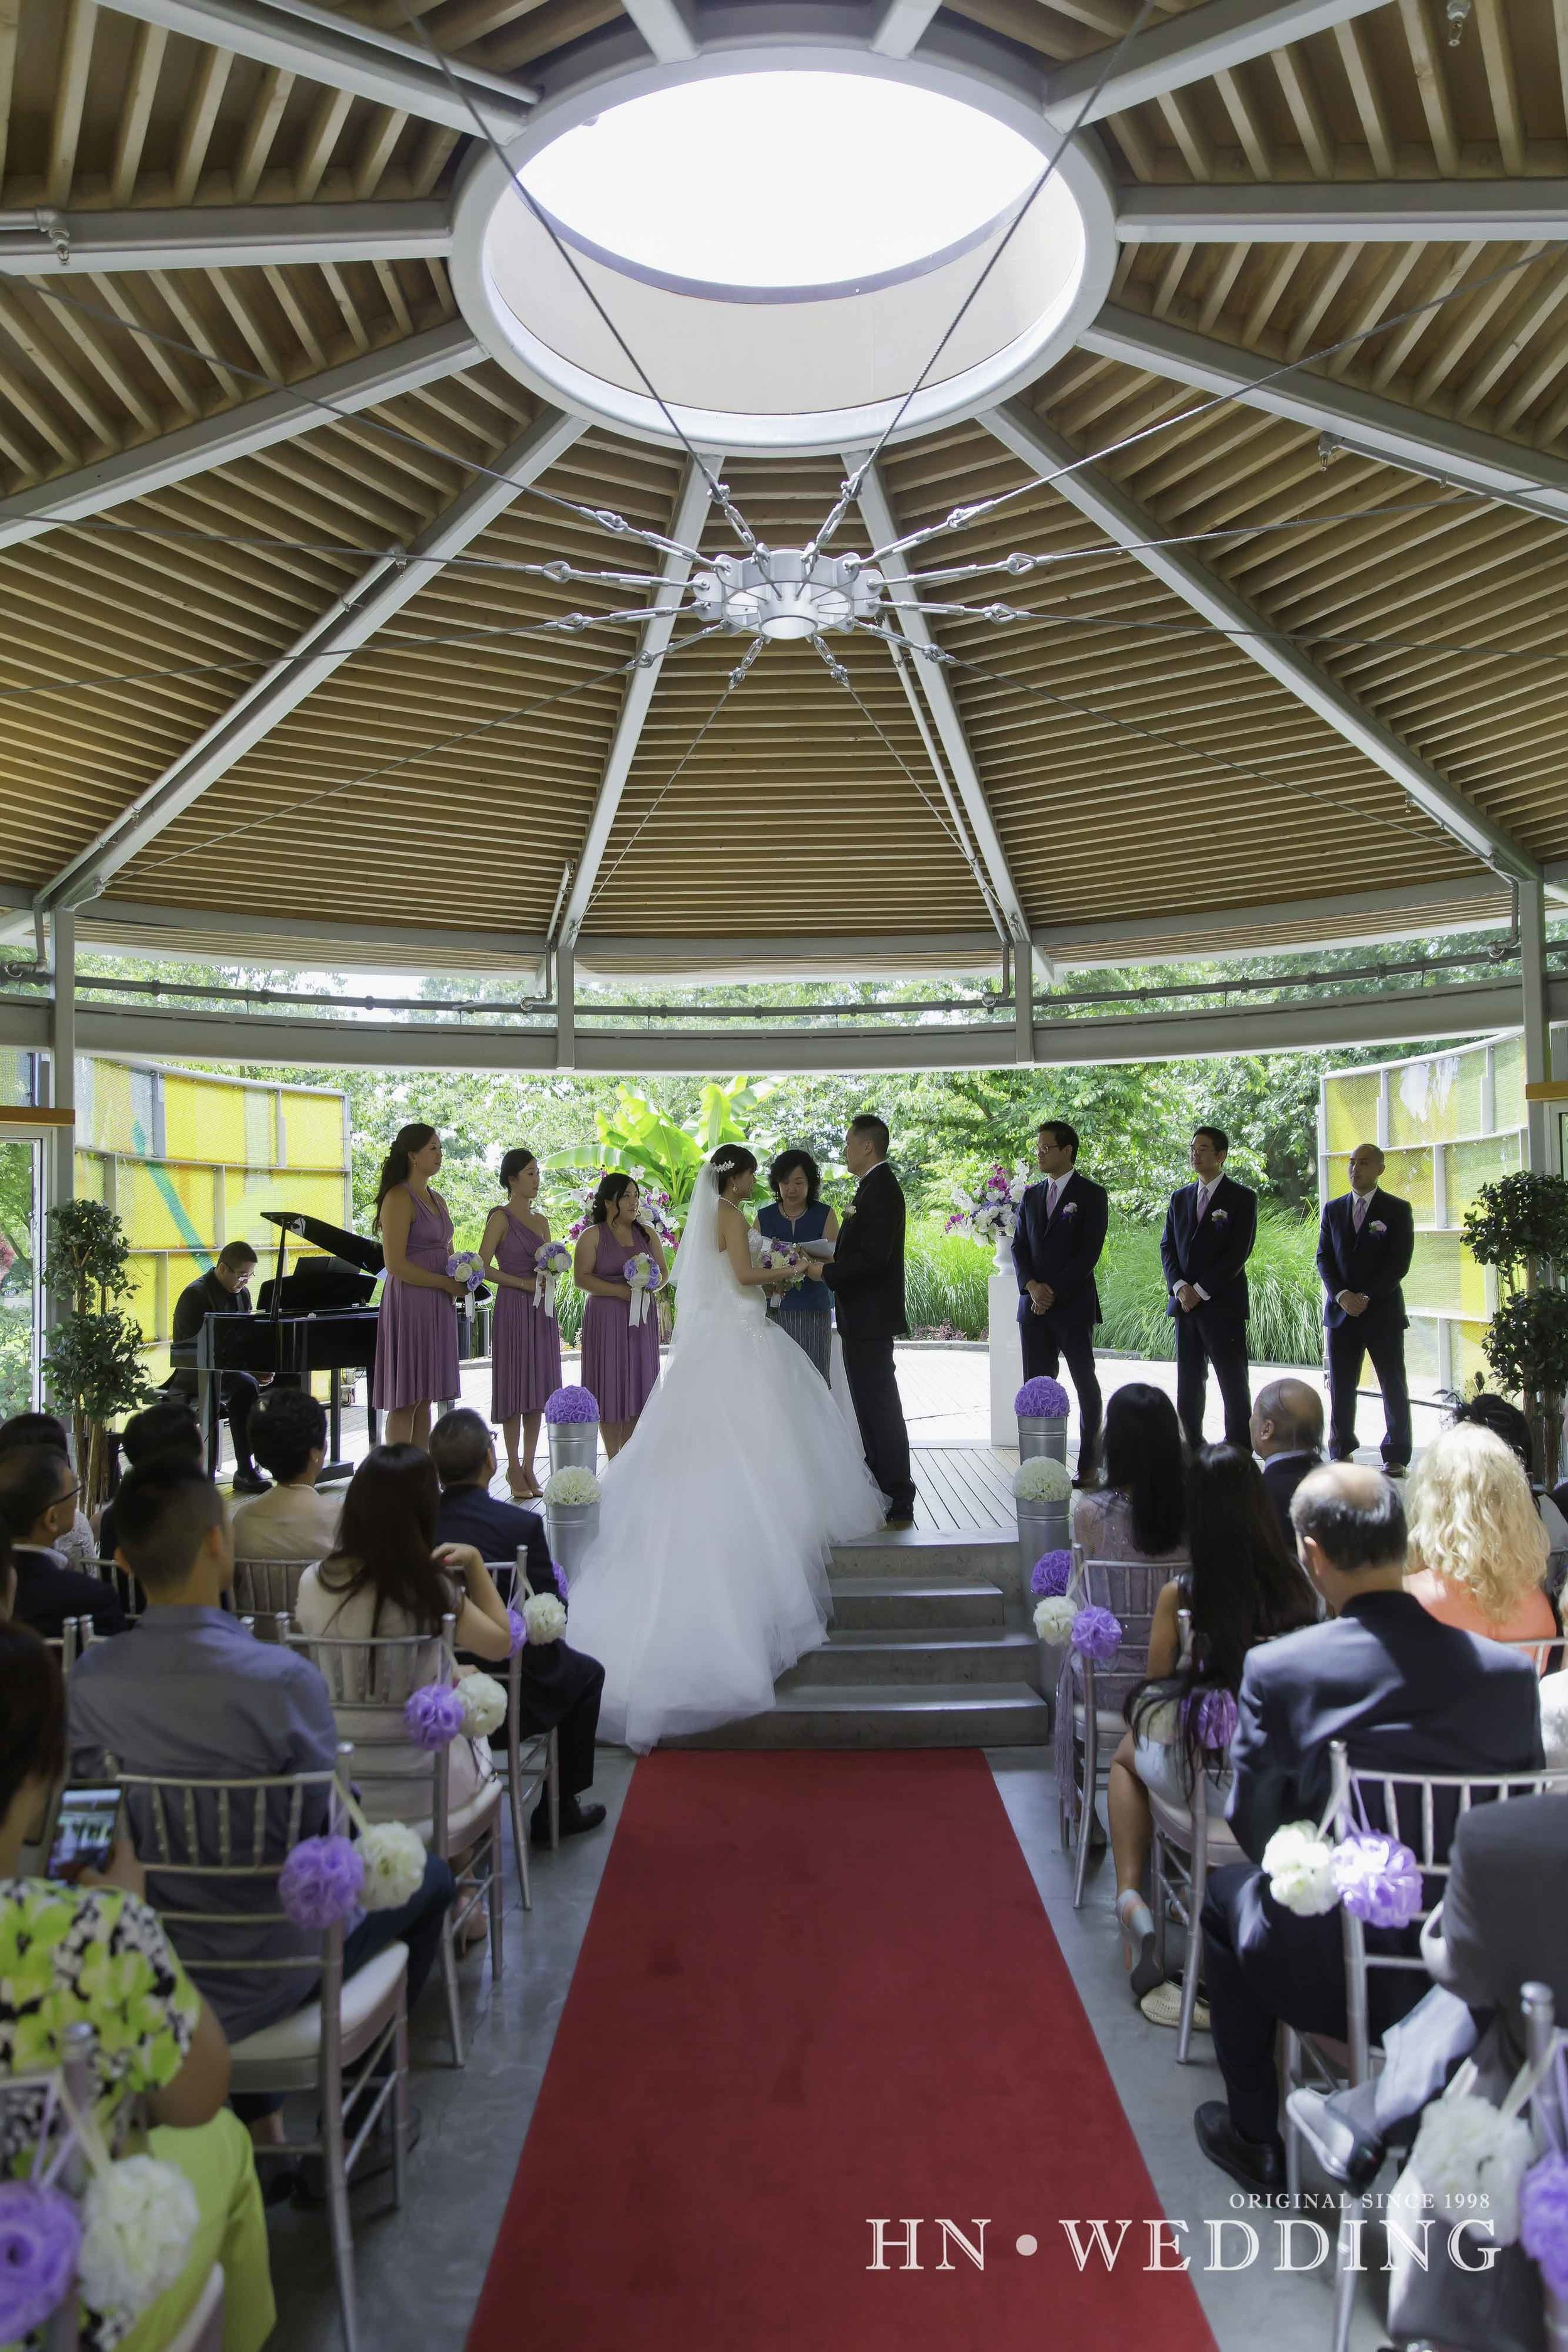 HNwedding-20160822-wedding-6149.jpg